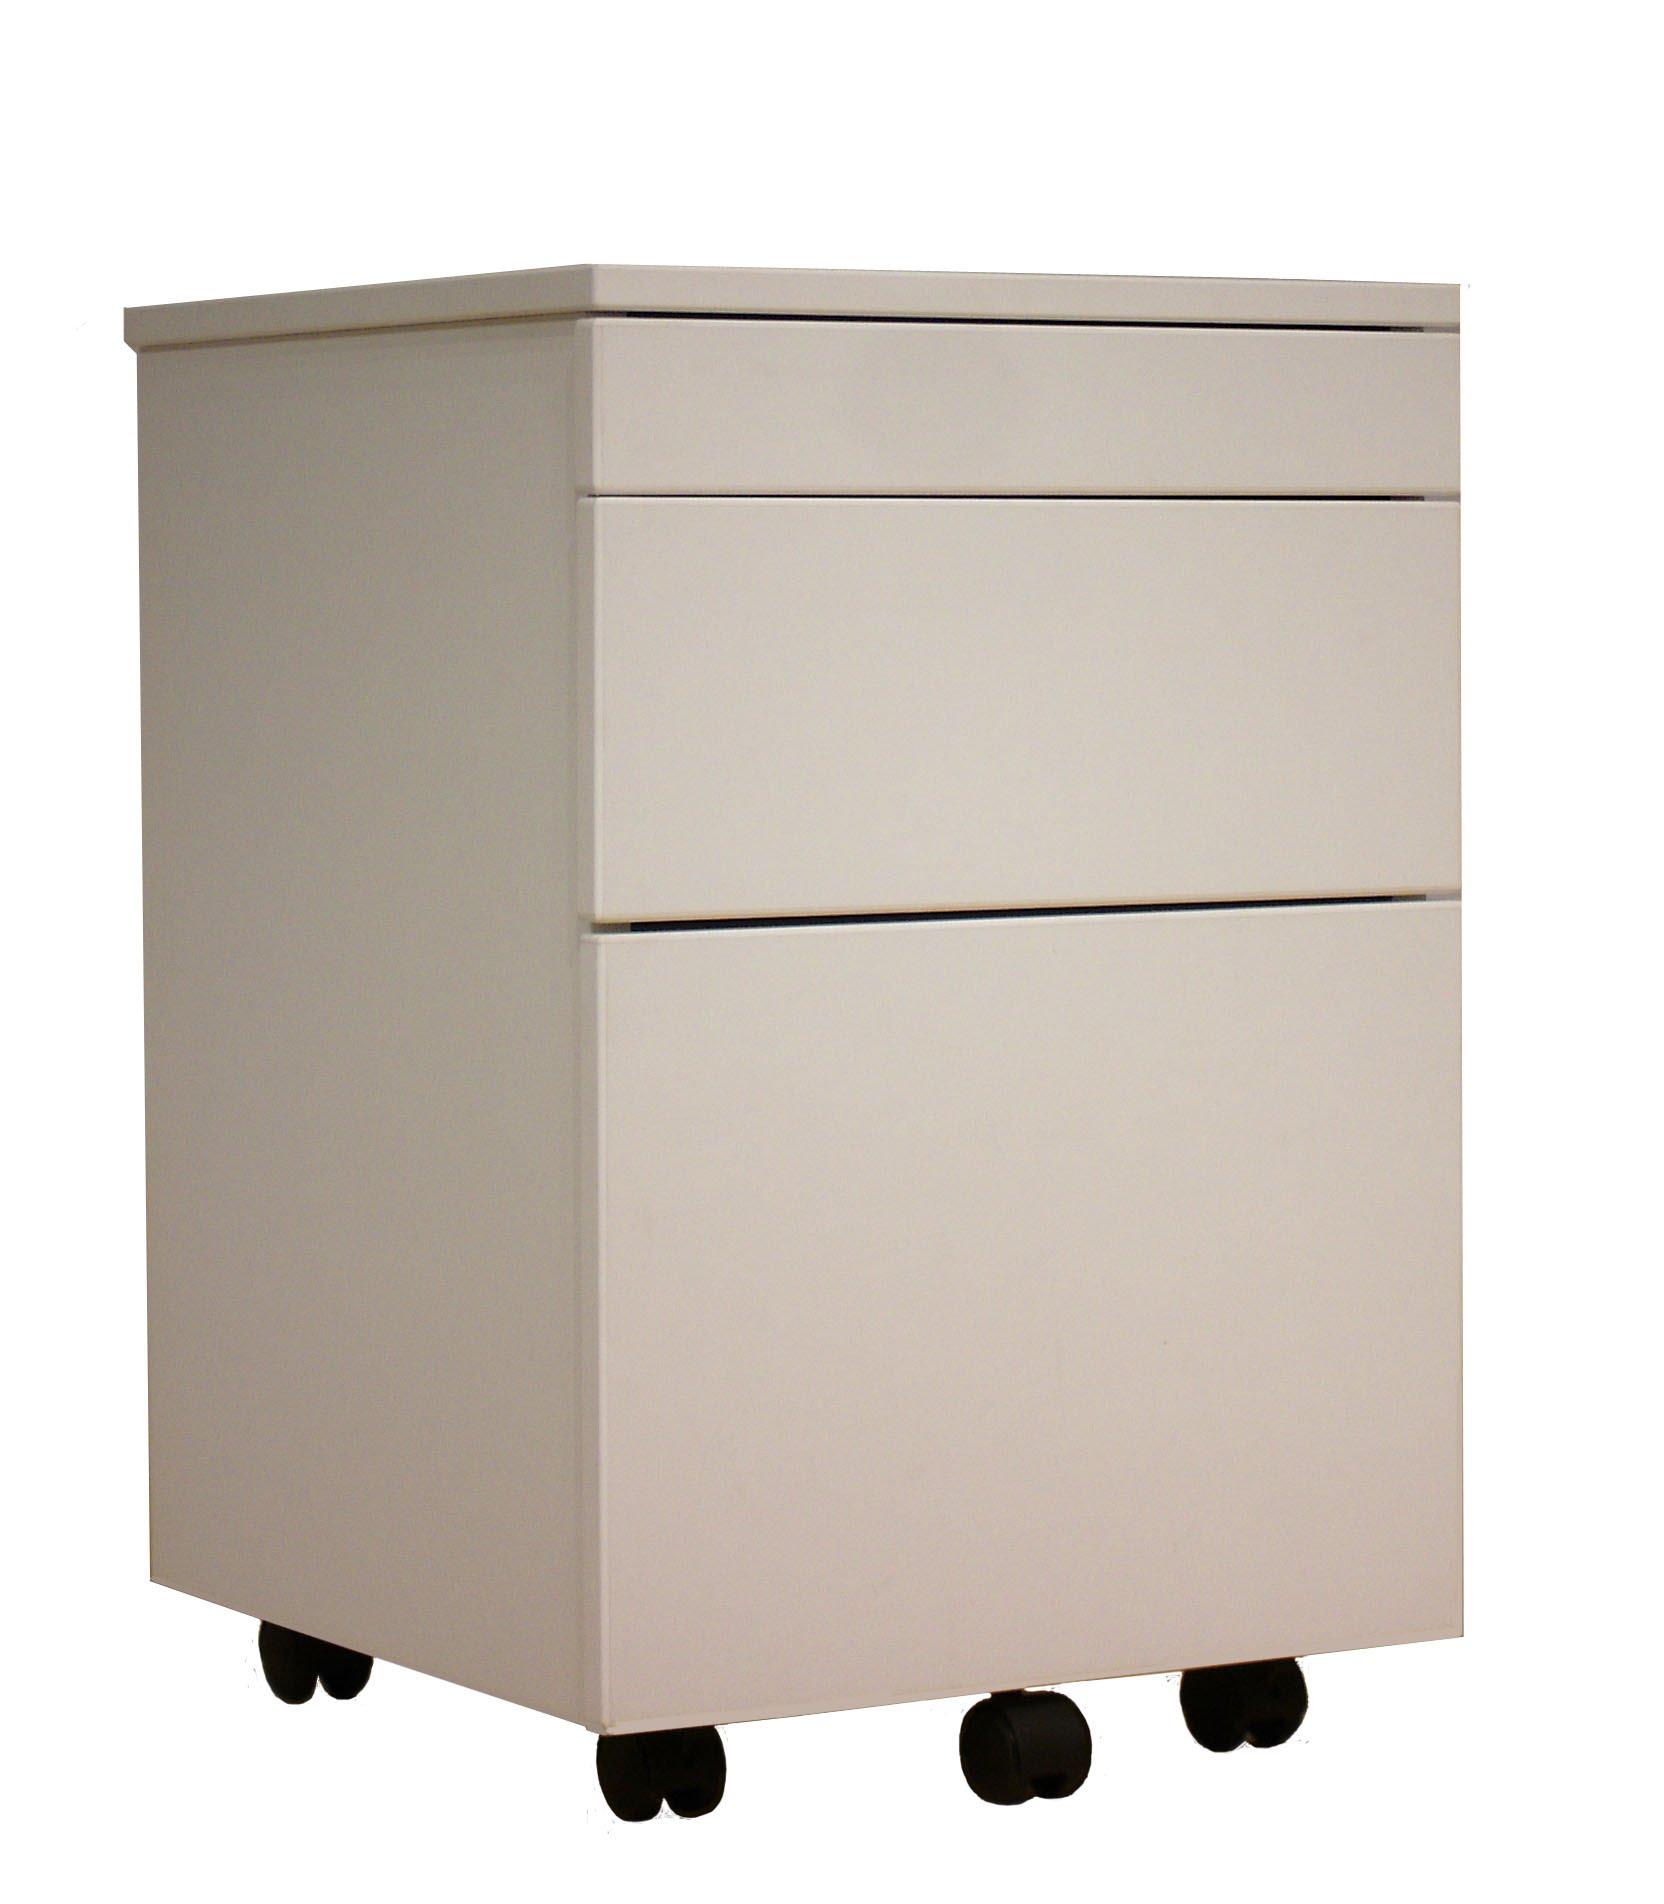 http://www.goezgo.tw/2011/12/goezgop-typepcb-cabinet.html